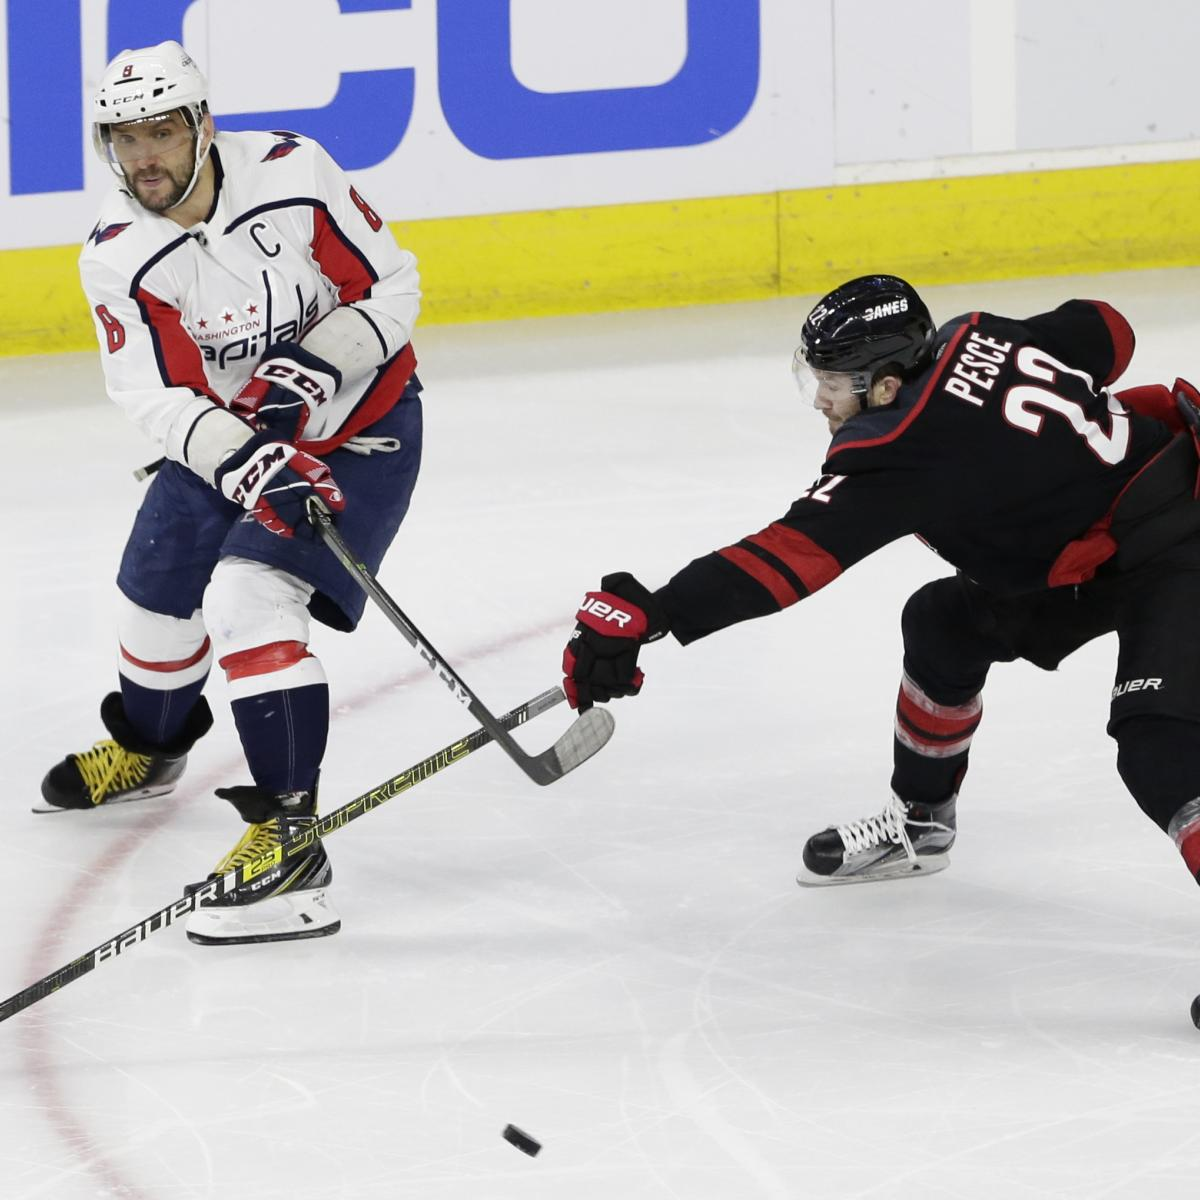 NHL Playoff Bracket 2019: Latest Stanley Cup Championship